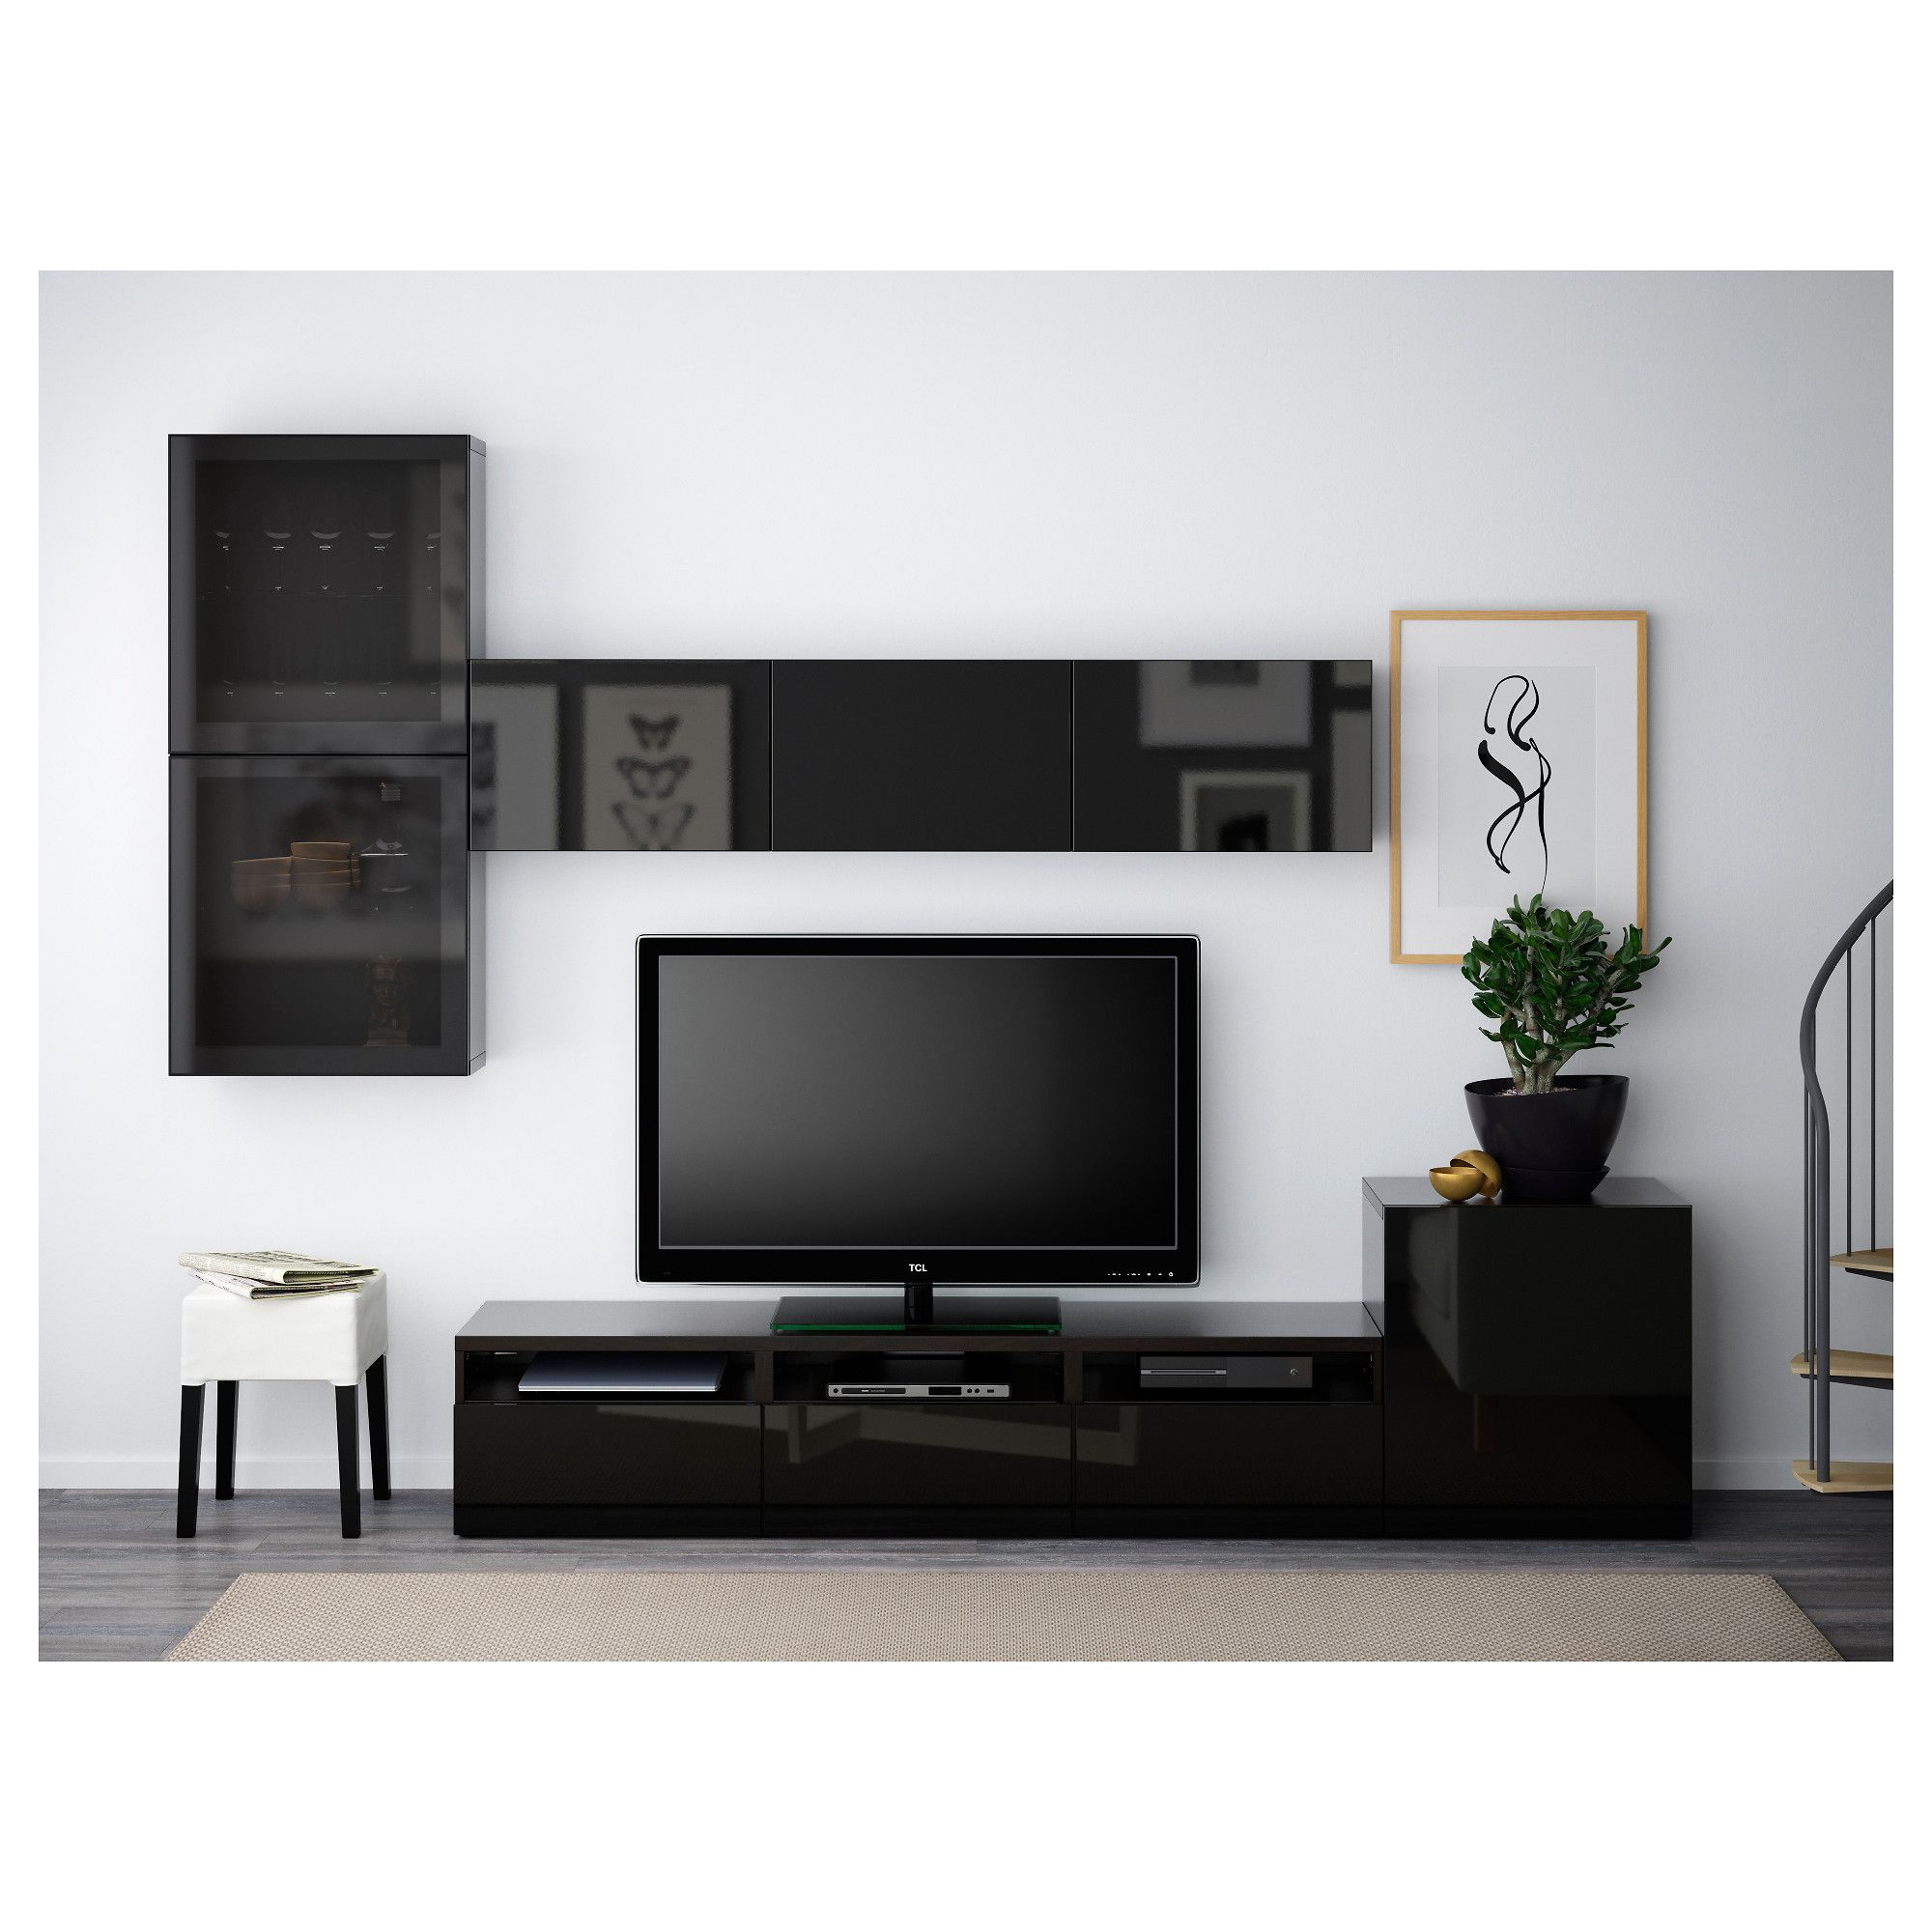 Ikea Besta Tv Storage Combination Glass Doors Black Brown Selsviken Ikea Living Room Living Room Entertainment Living Room Tv Wall